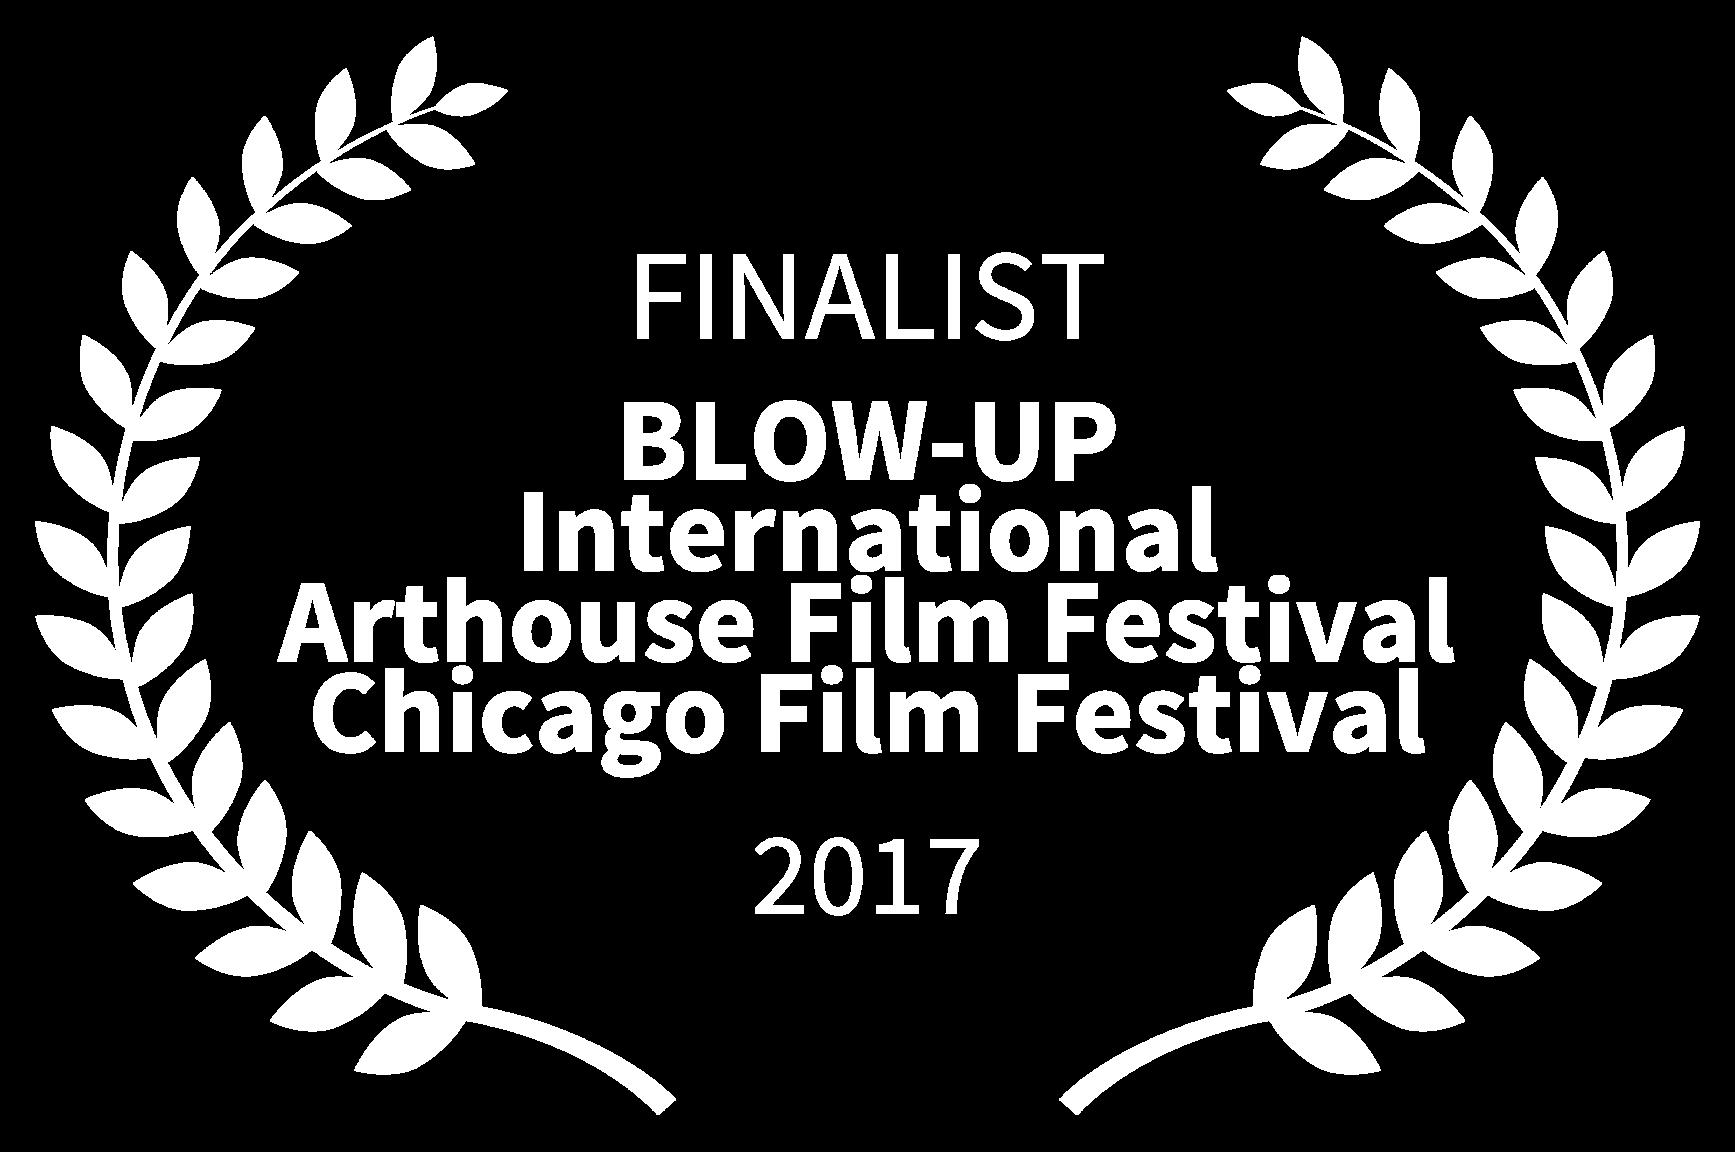 FINALIST - BLOW-UP International Arthouse Film Festival Chicago Film Festival - 2017.png